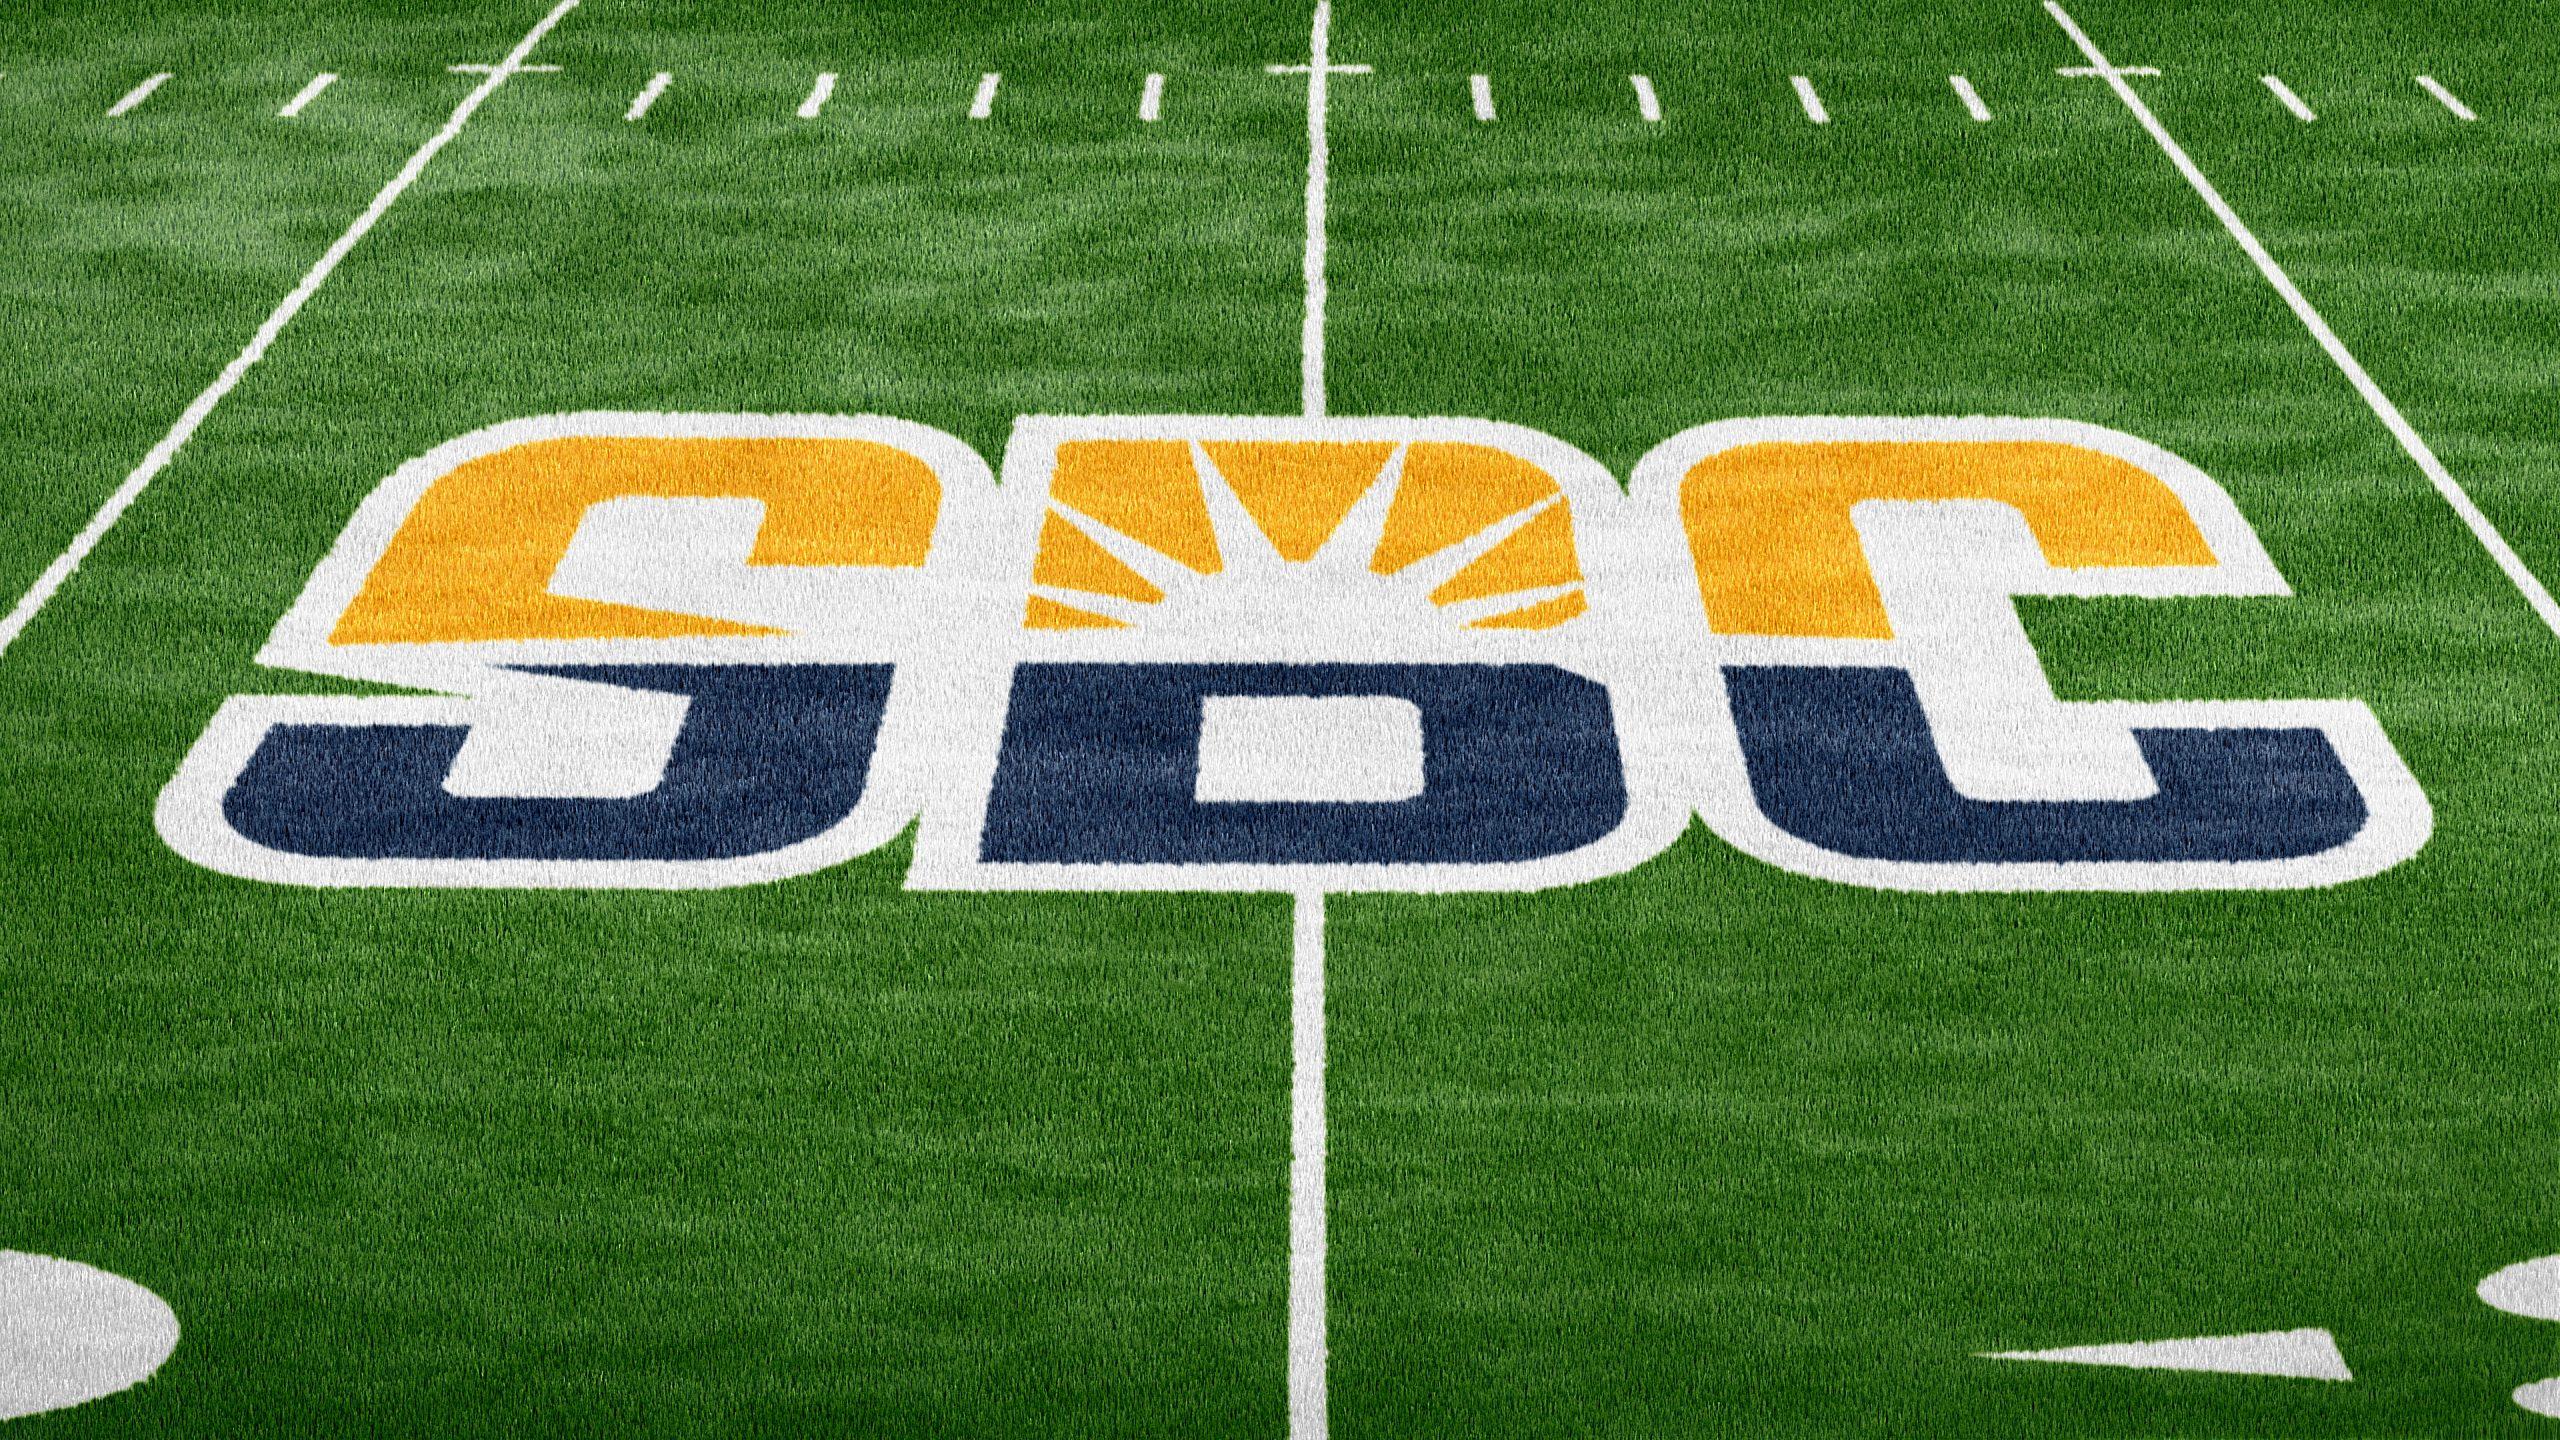 Sun Belt Conference logo on turf field/sun belt conference football